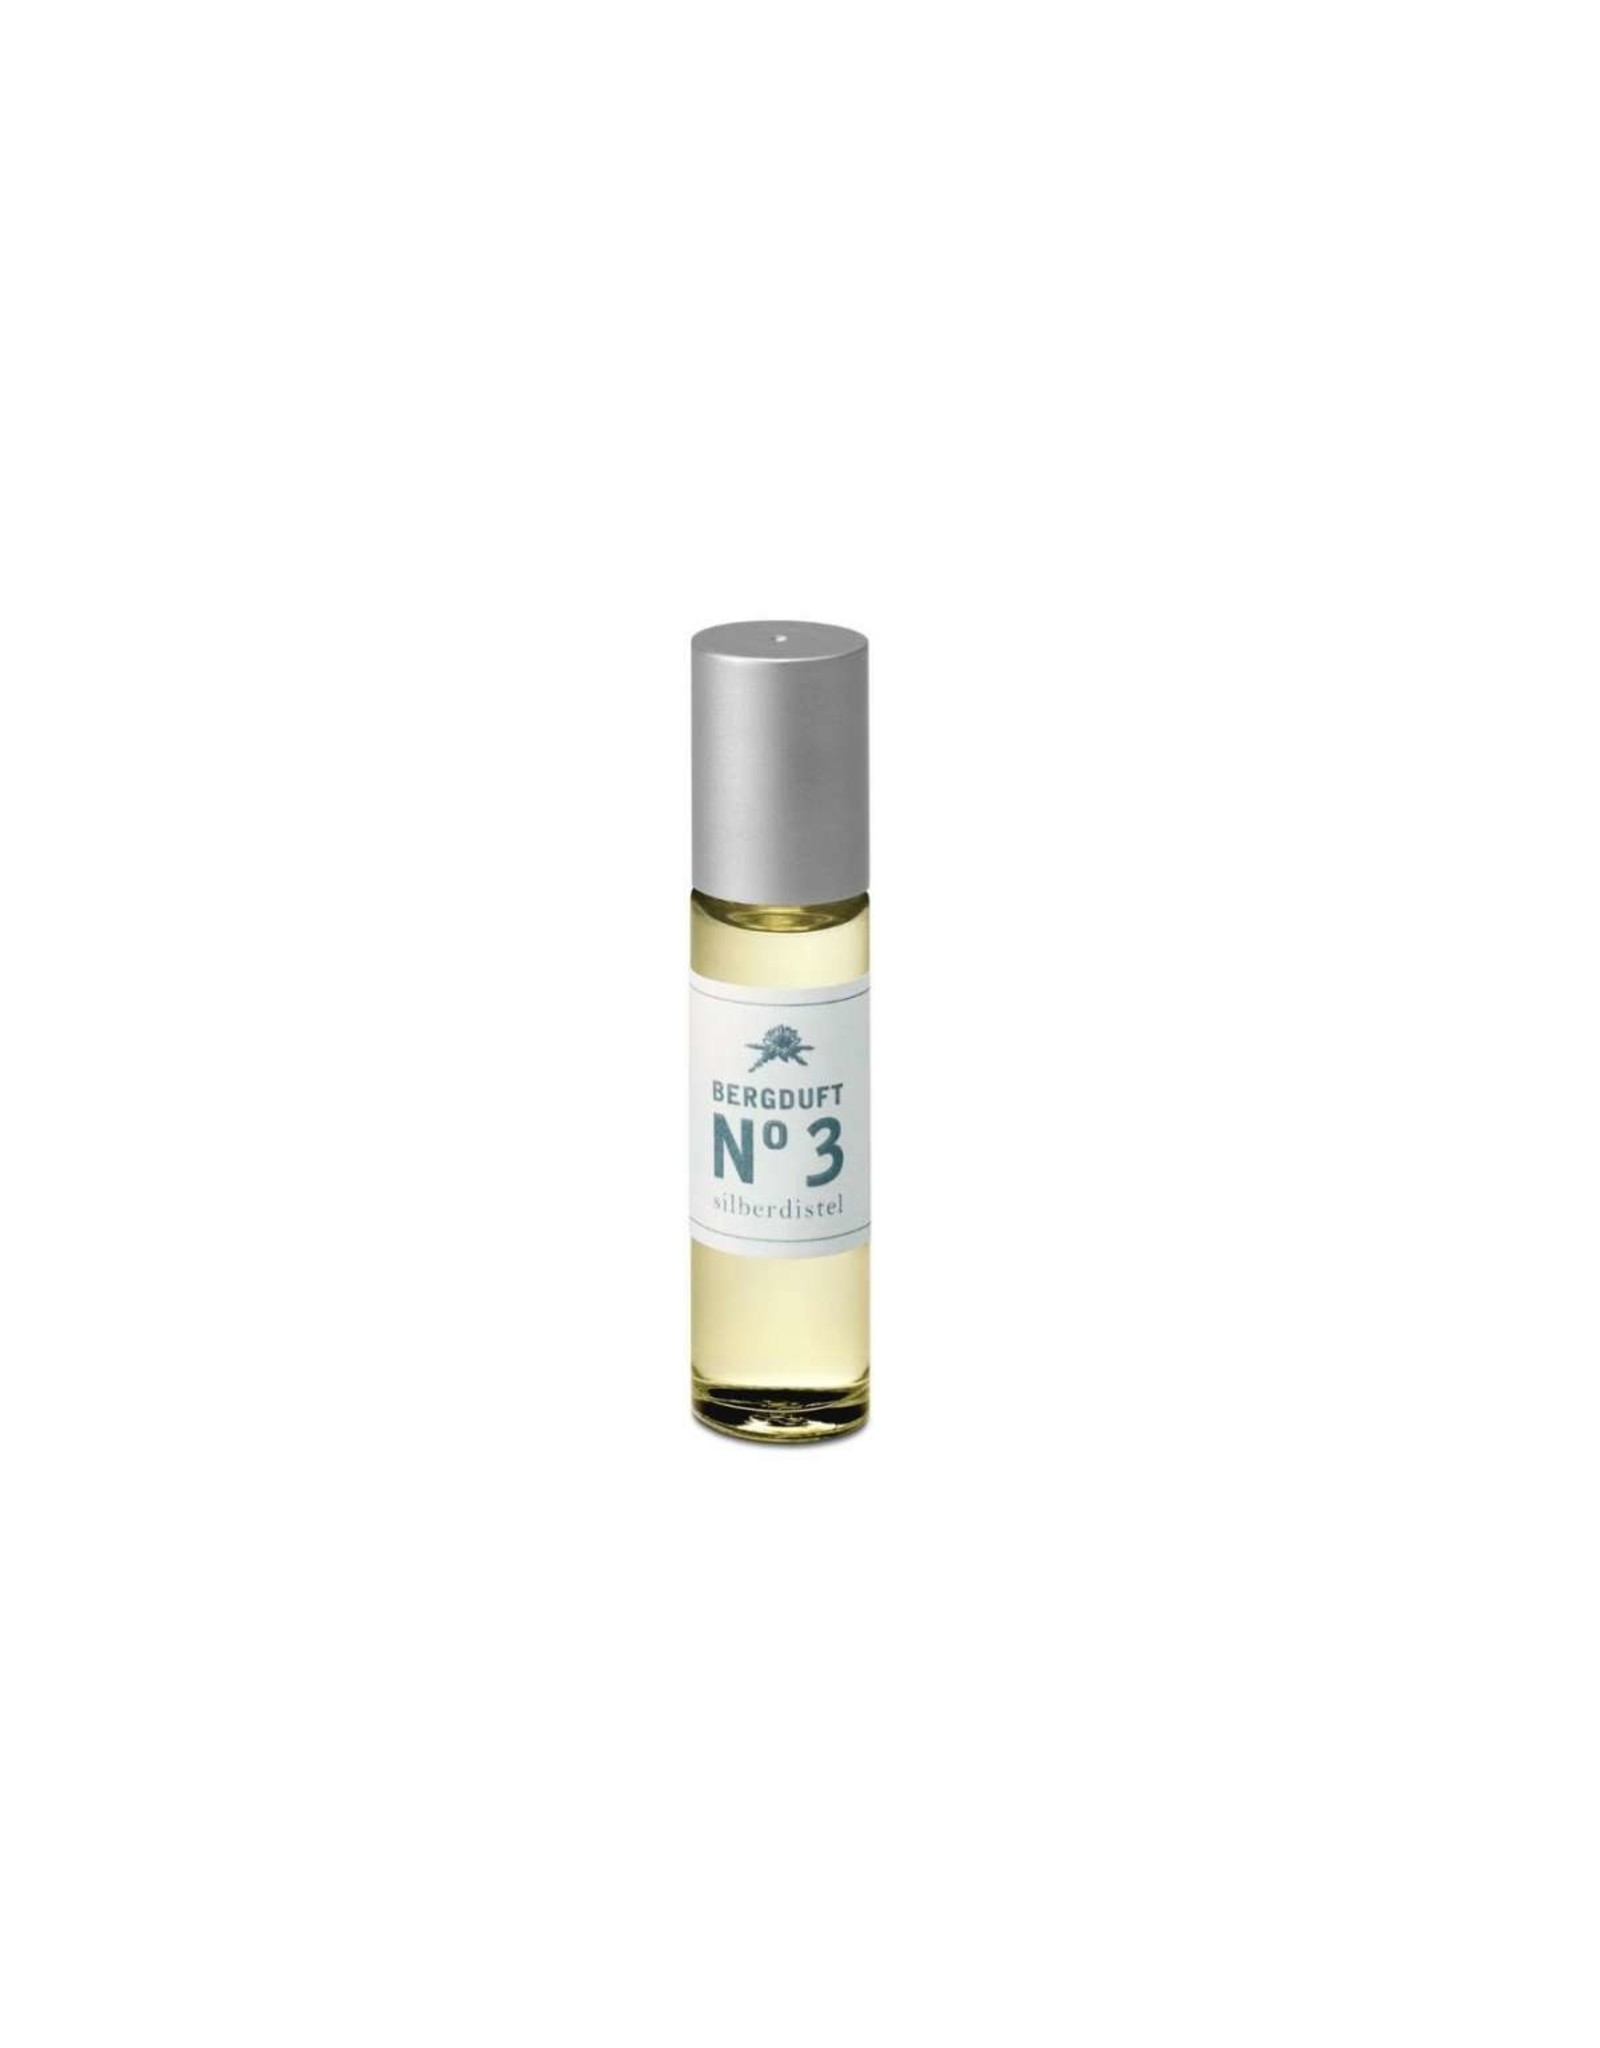 Bergduft Eau de Parfum Rollon N° 3 Silberdistel